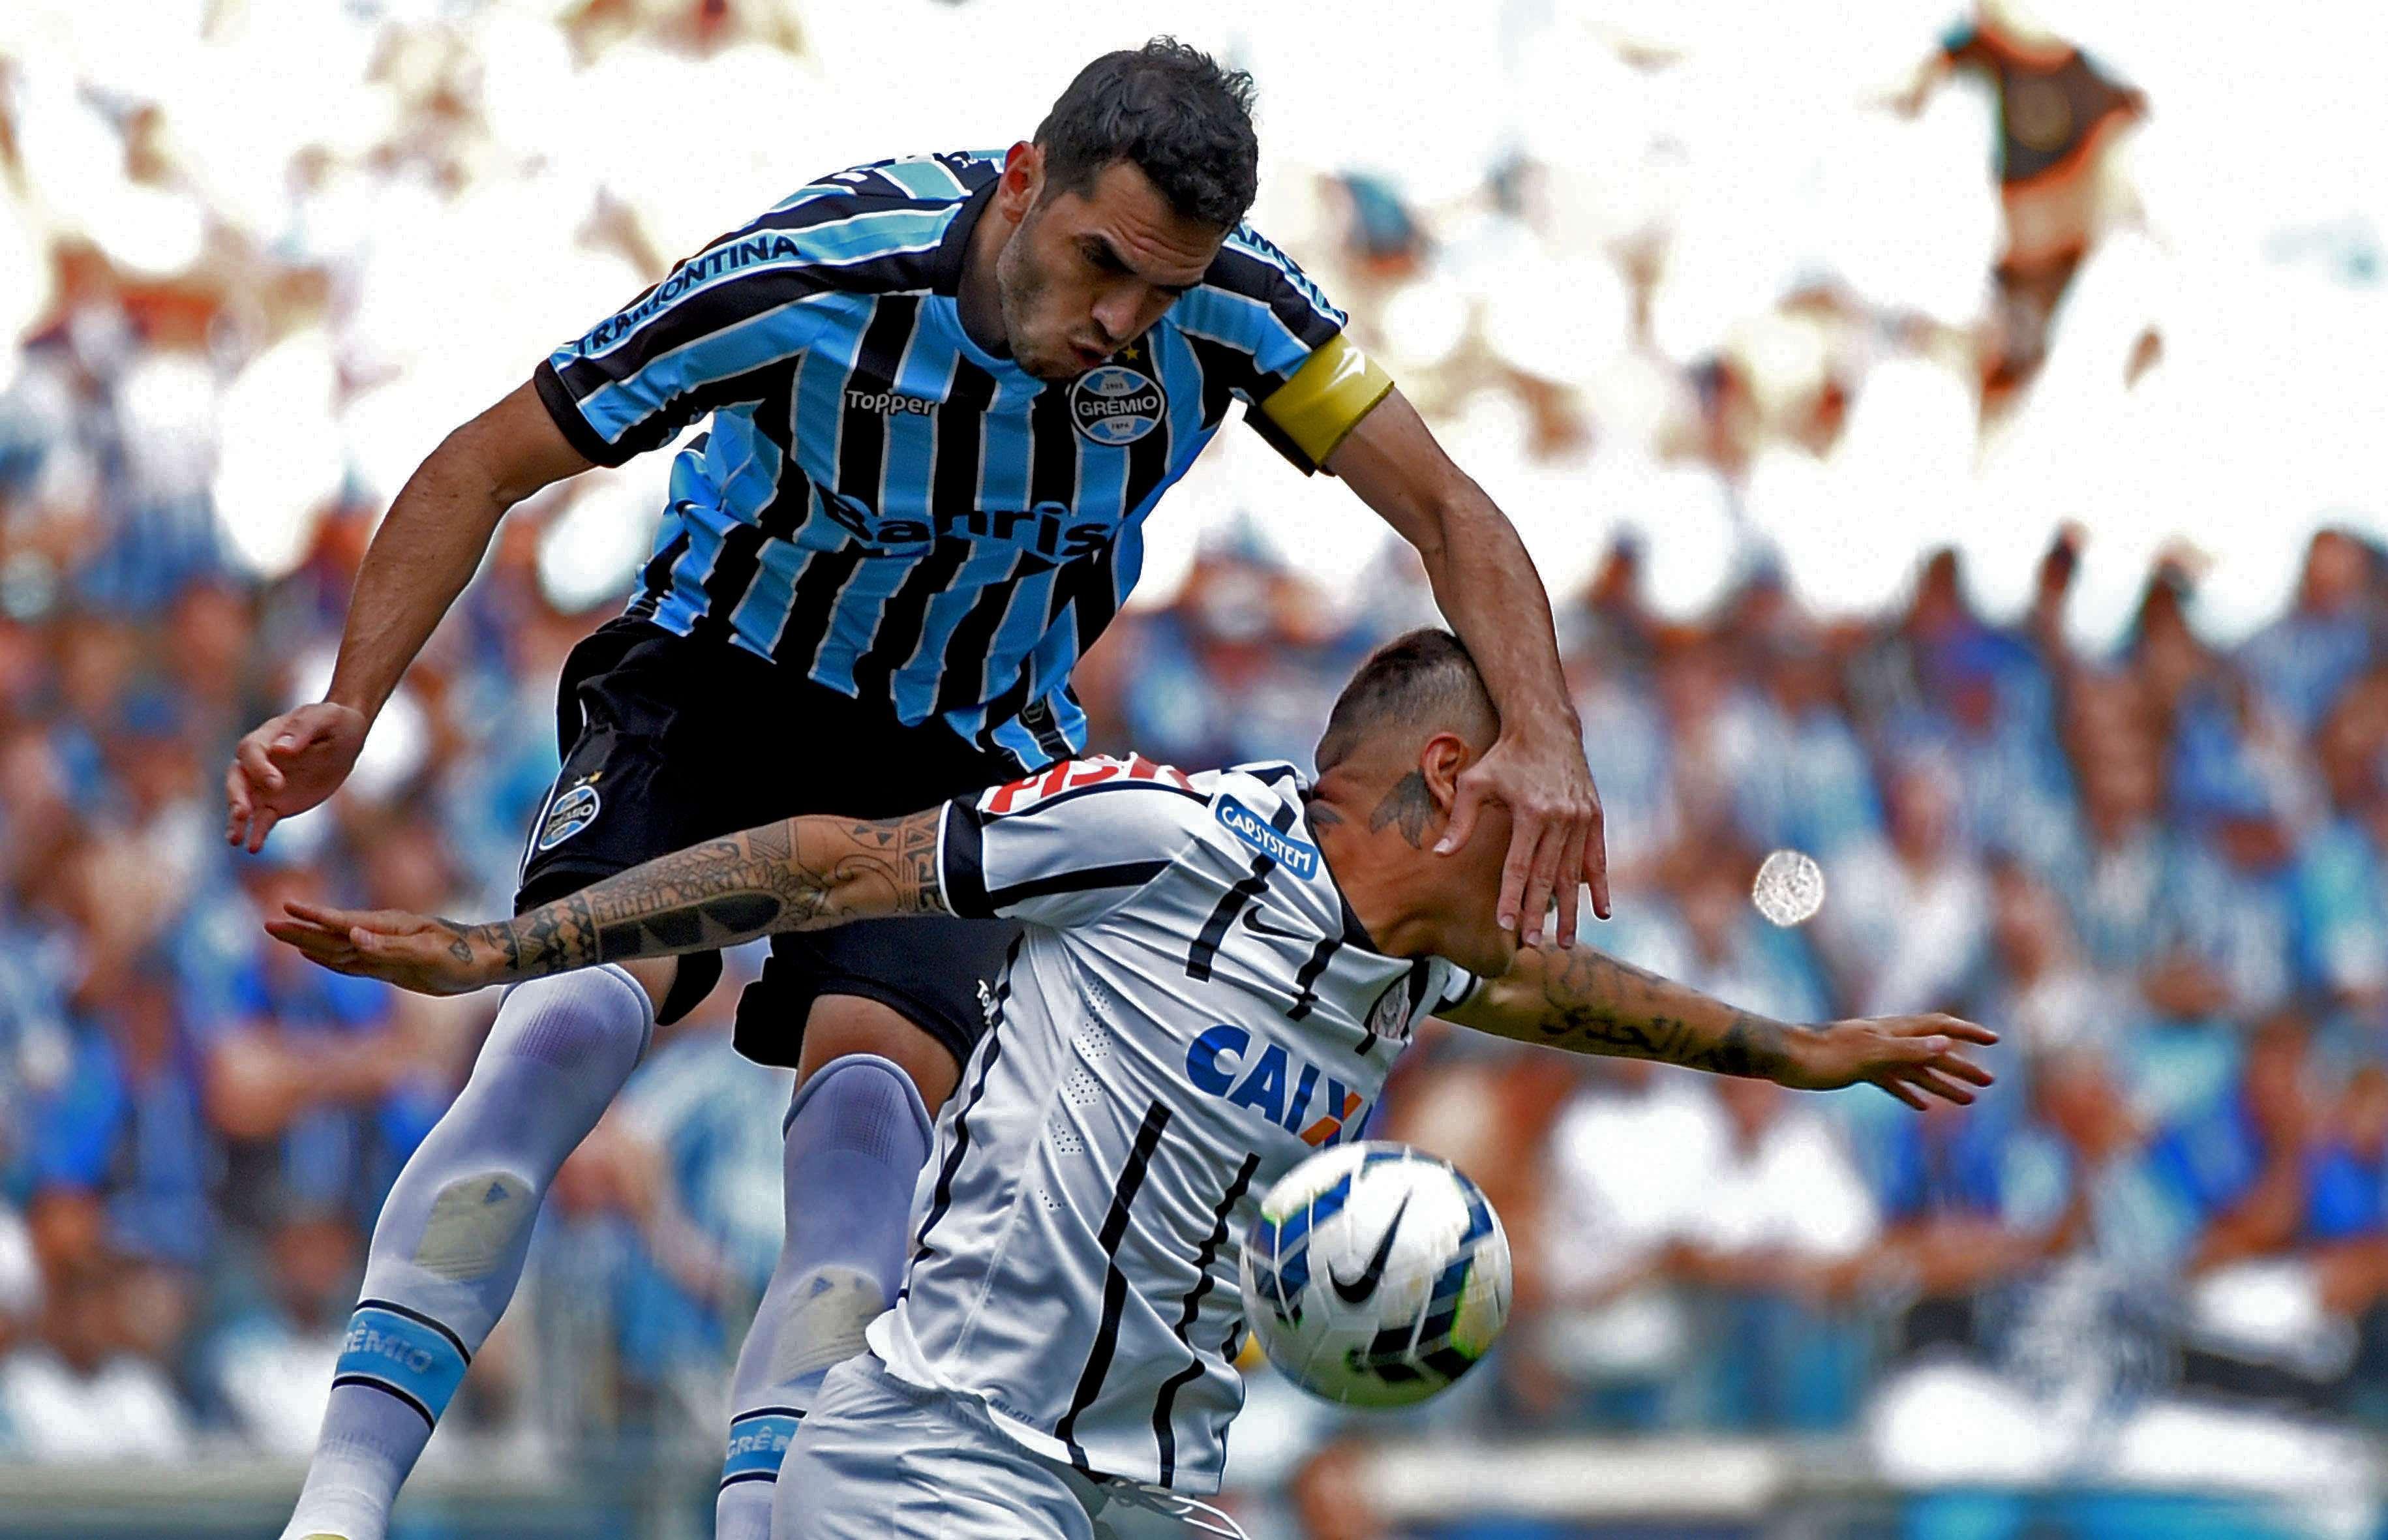 Rhodolfo tenta desarmar Guerrero Foto: Lucas Uebel/Grêmio FBPA/Divulgação